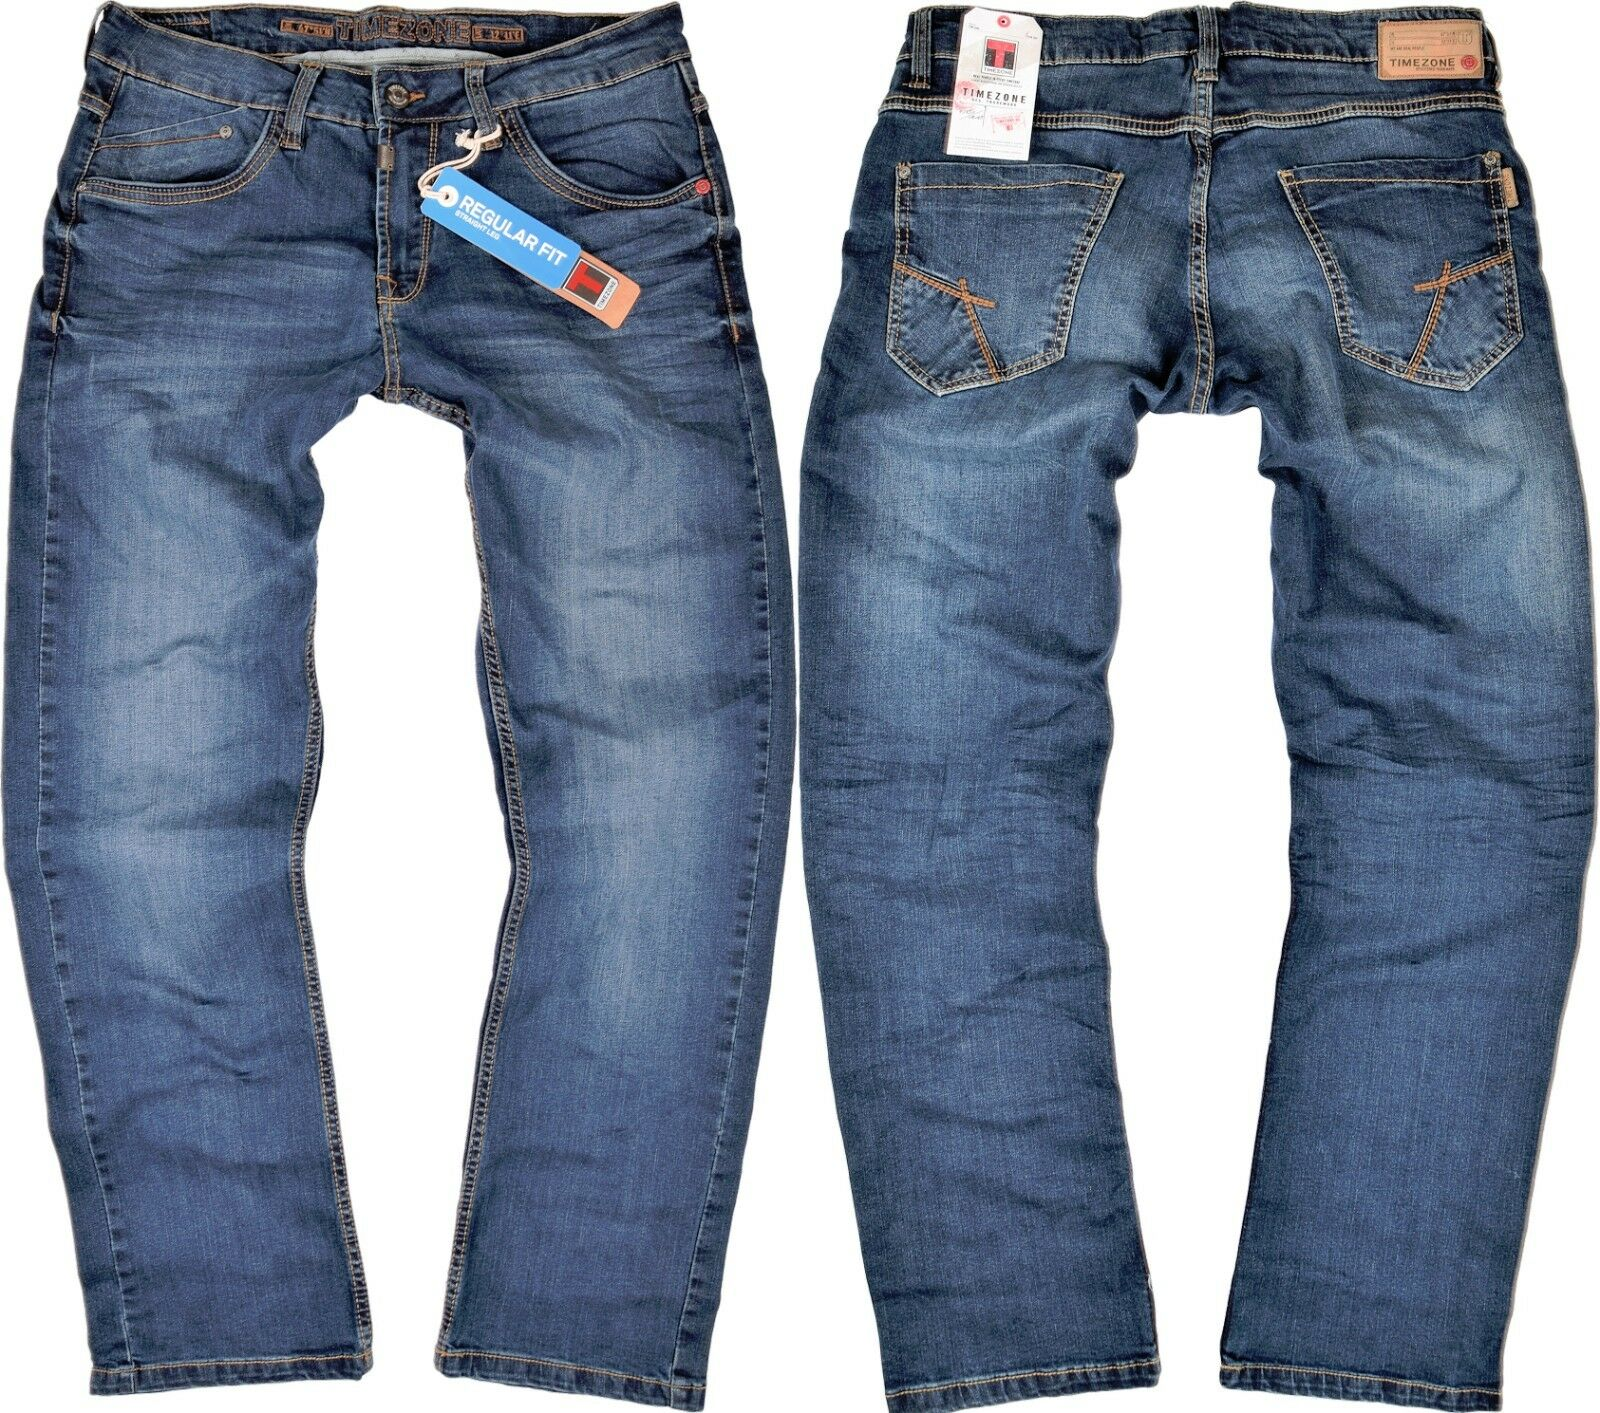 Timezone Herren Jeans Jason TZ 3977 blau Jeanshose Hose Angebot rotuziert  | Speichern